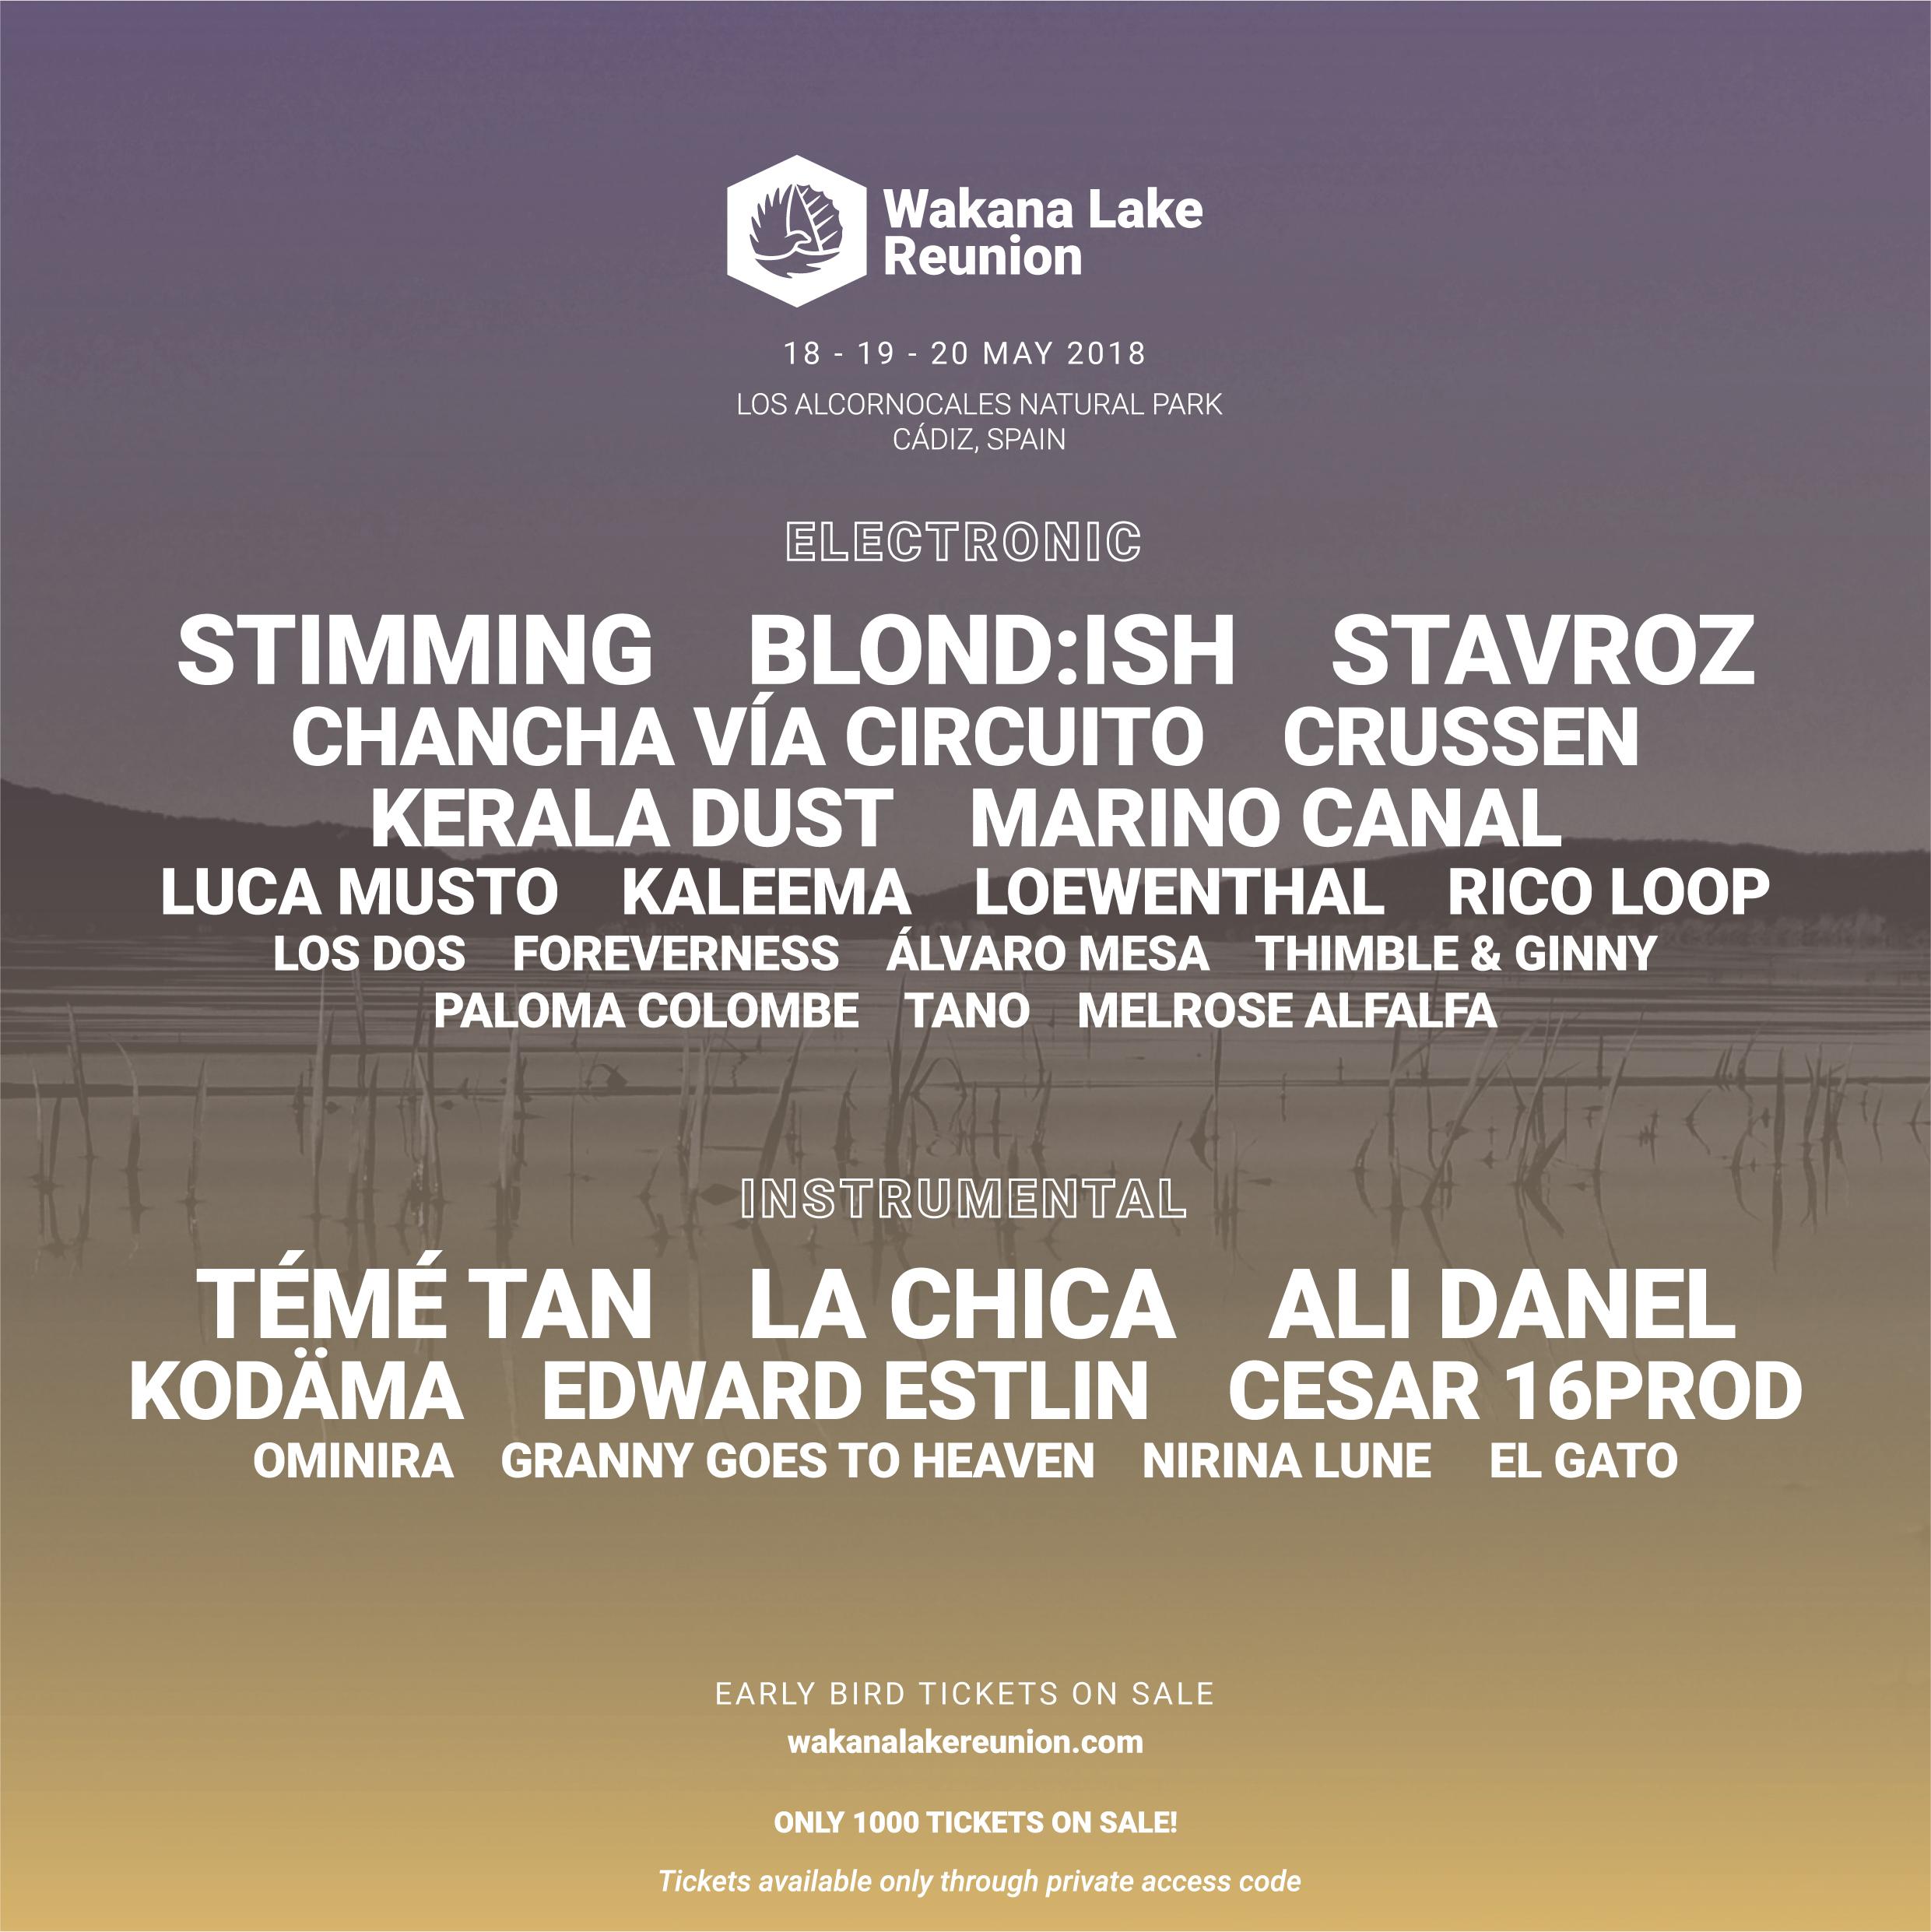 festivales CARTEL WAKANA LAKE REUNION